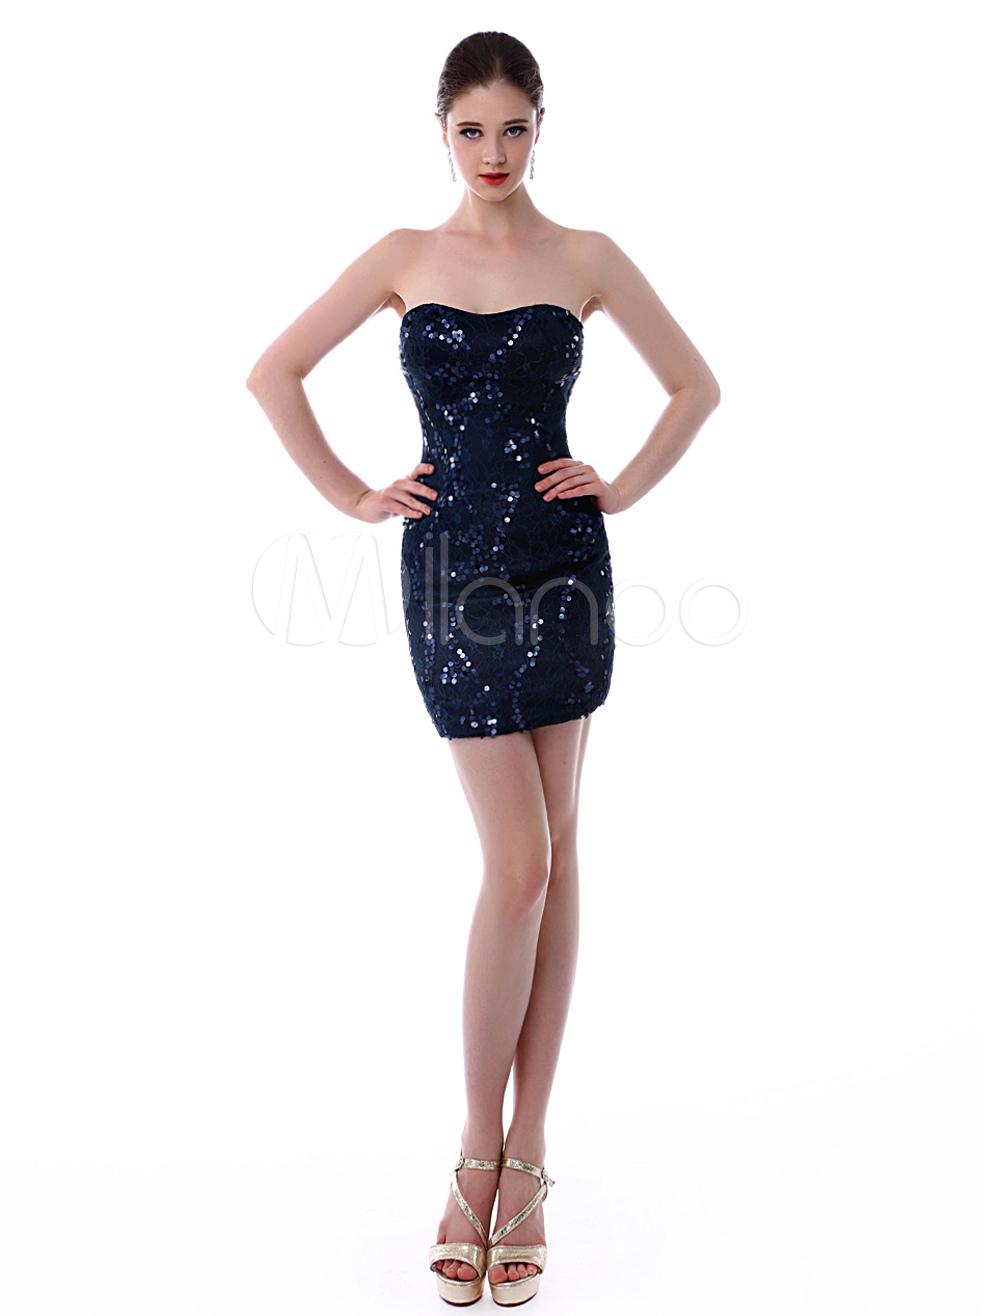 Elegant Dark Navy Strapless Lace Sequined Short Sheath Cocktail Dress (Wedding Cocktail Dresses) photo